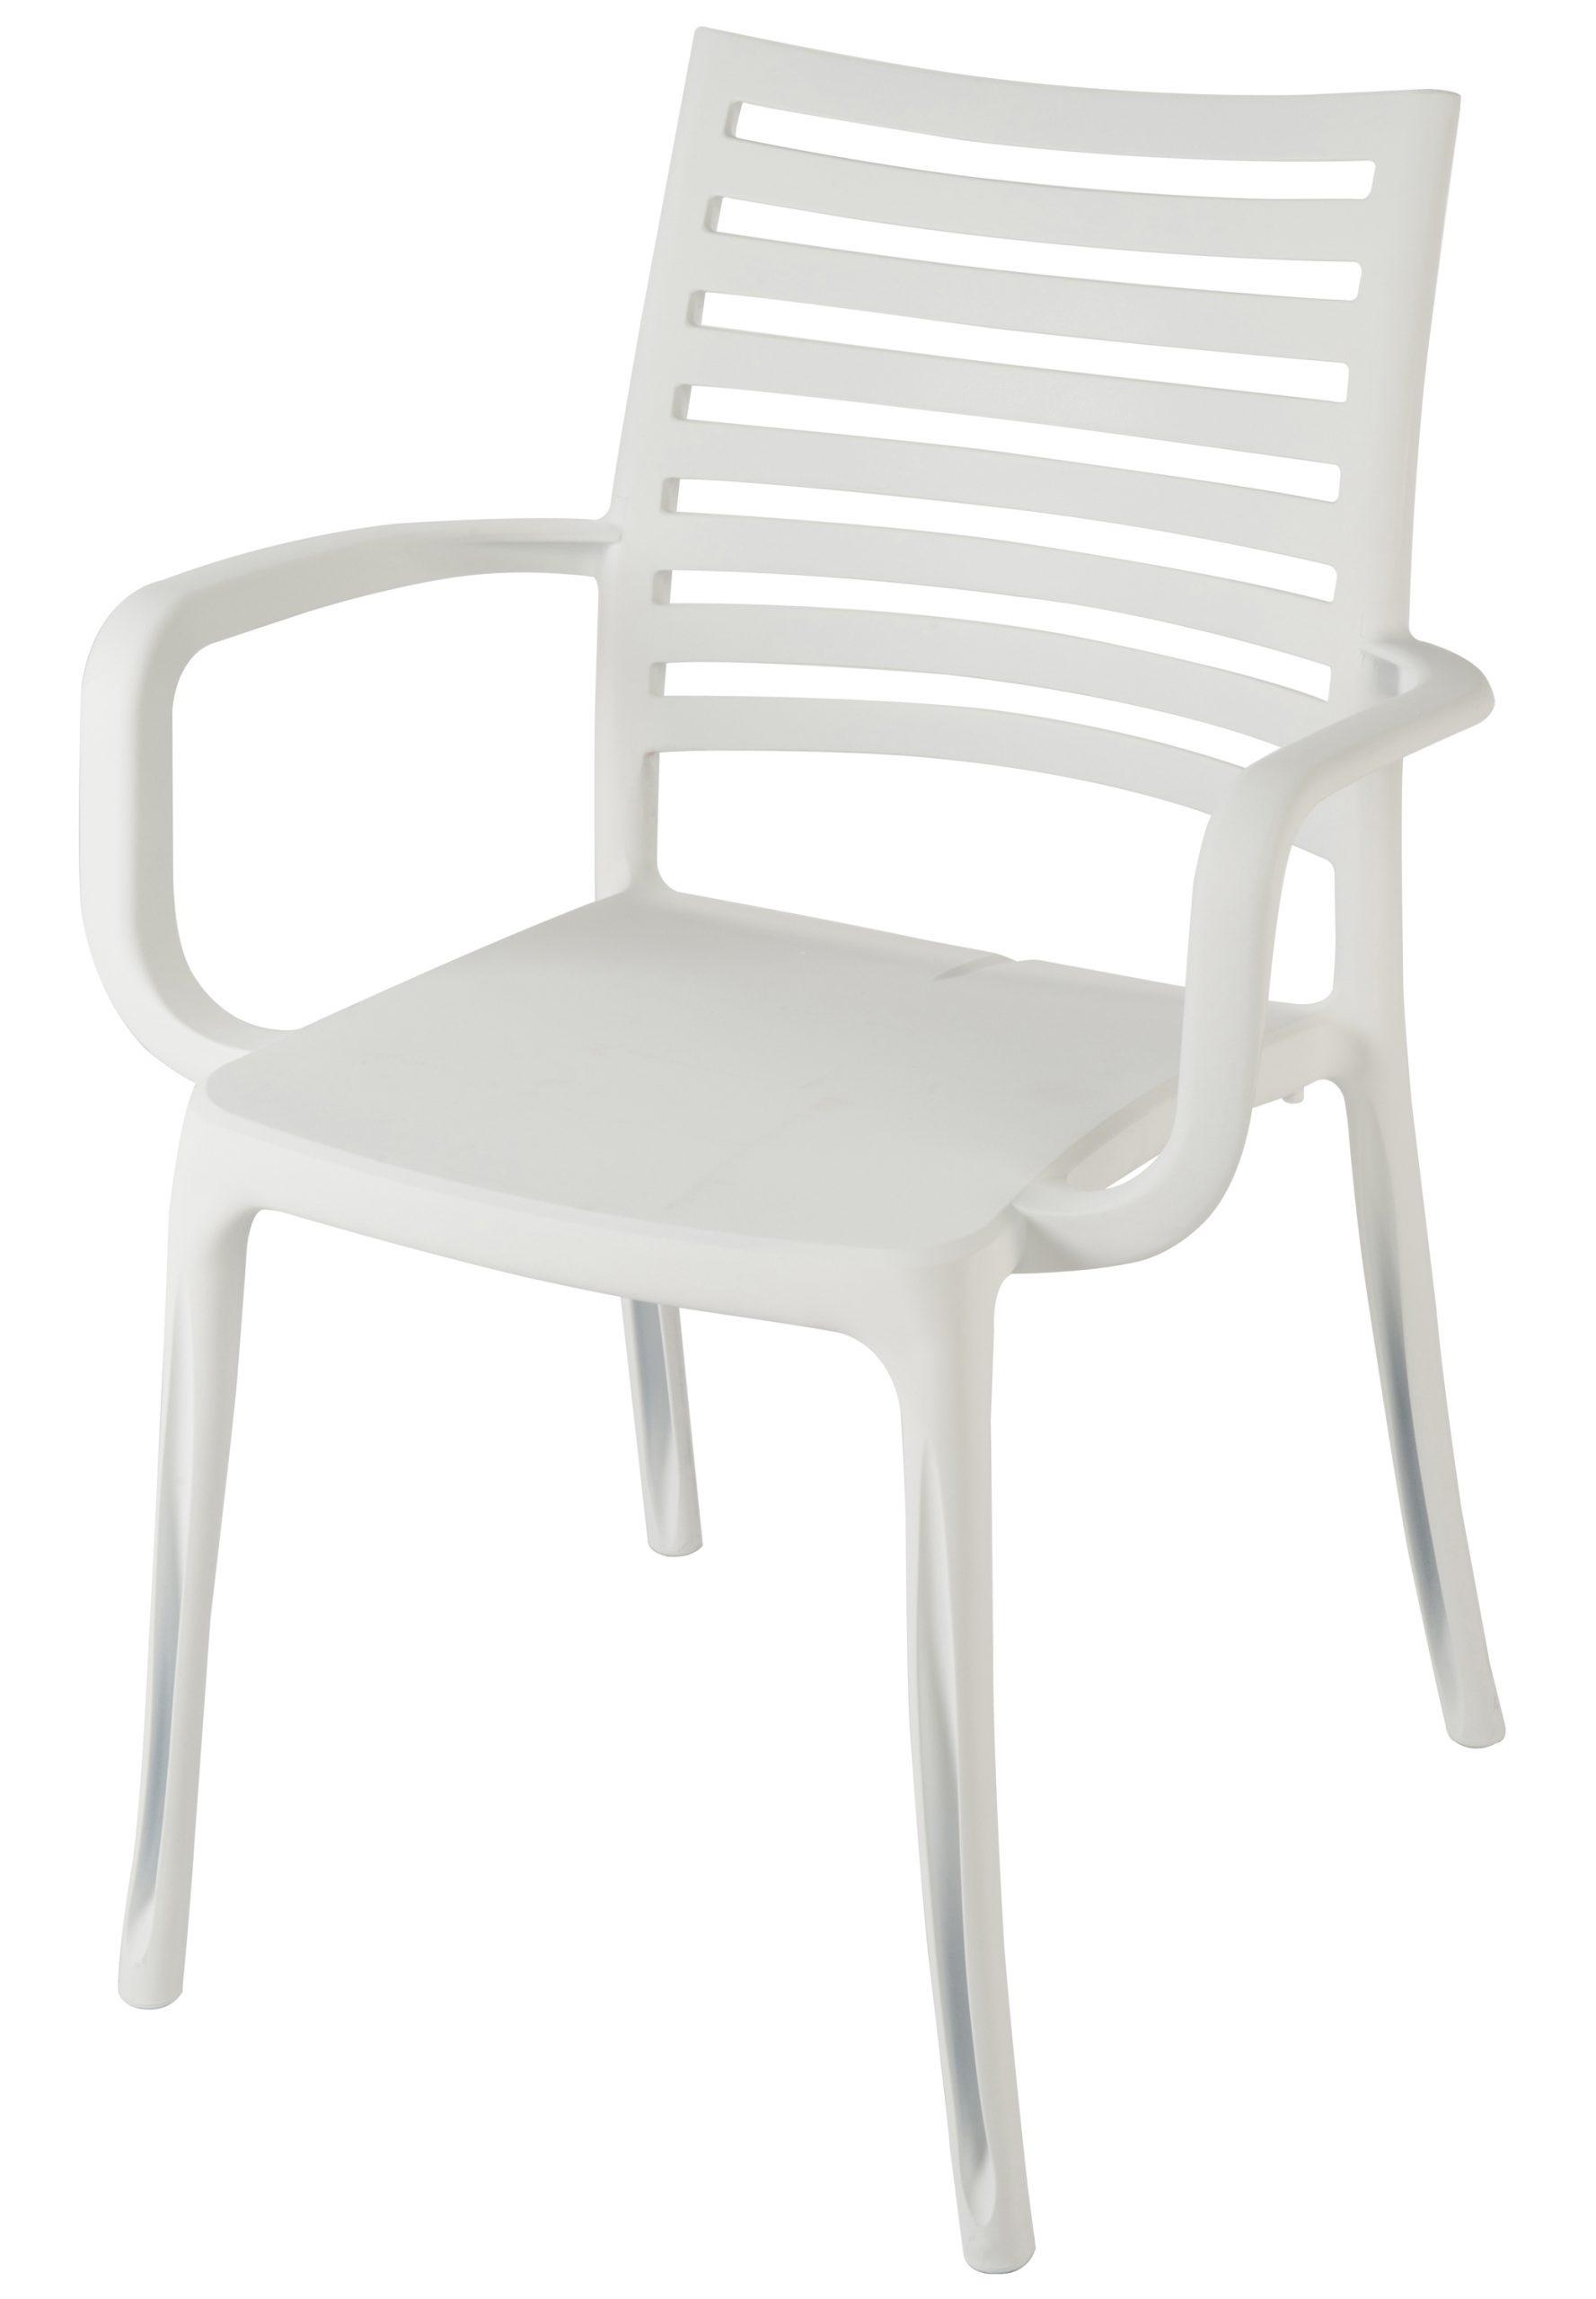 Sunday Garden Chair   Grosfillex à Chaise De Jardin Grosfillex